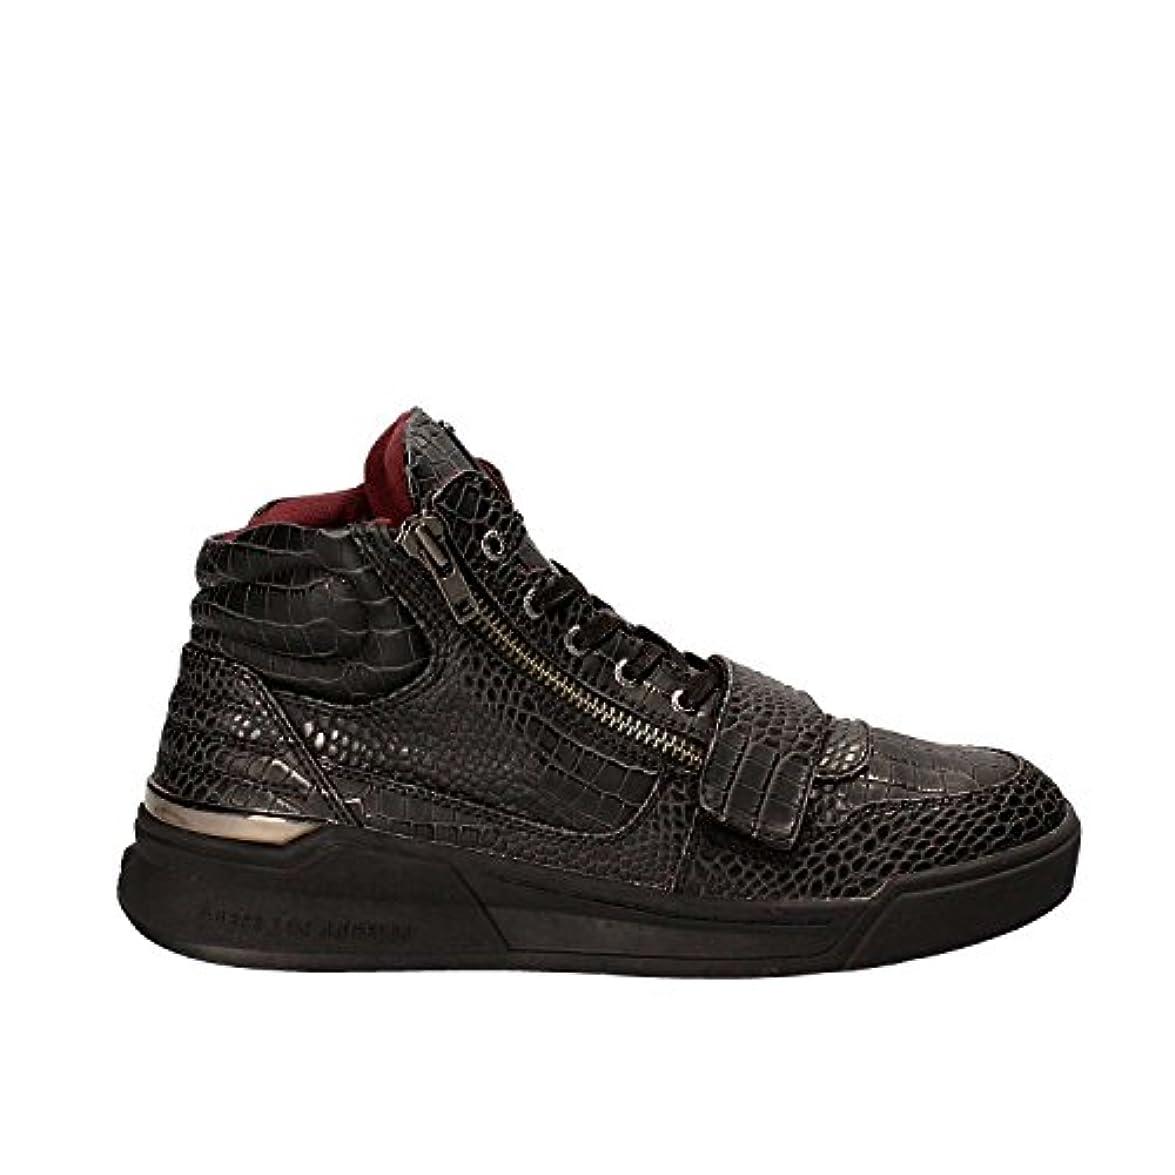 Guess Sneaker Fmknb4 Pel12 Size 44 eu